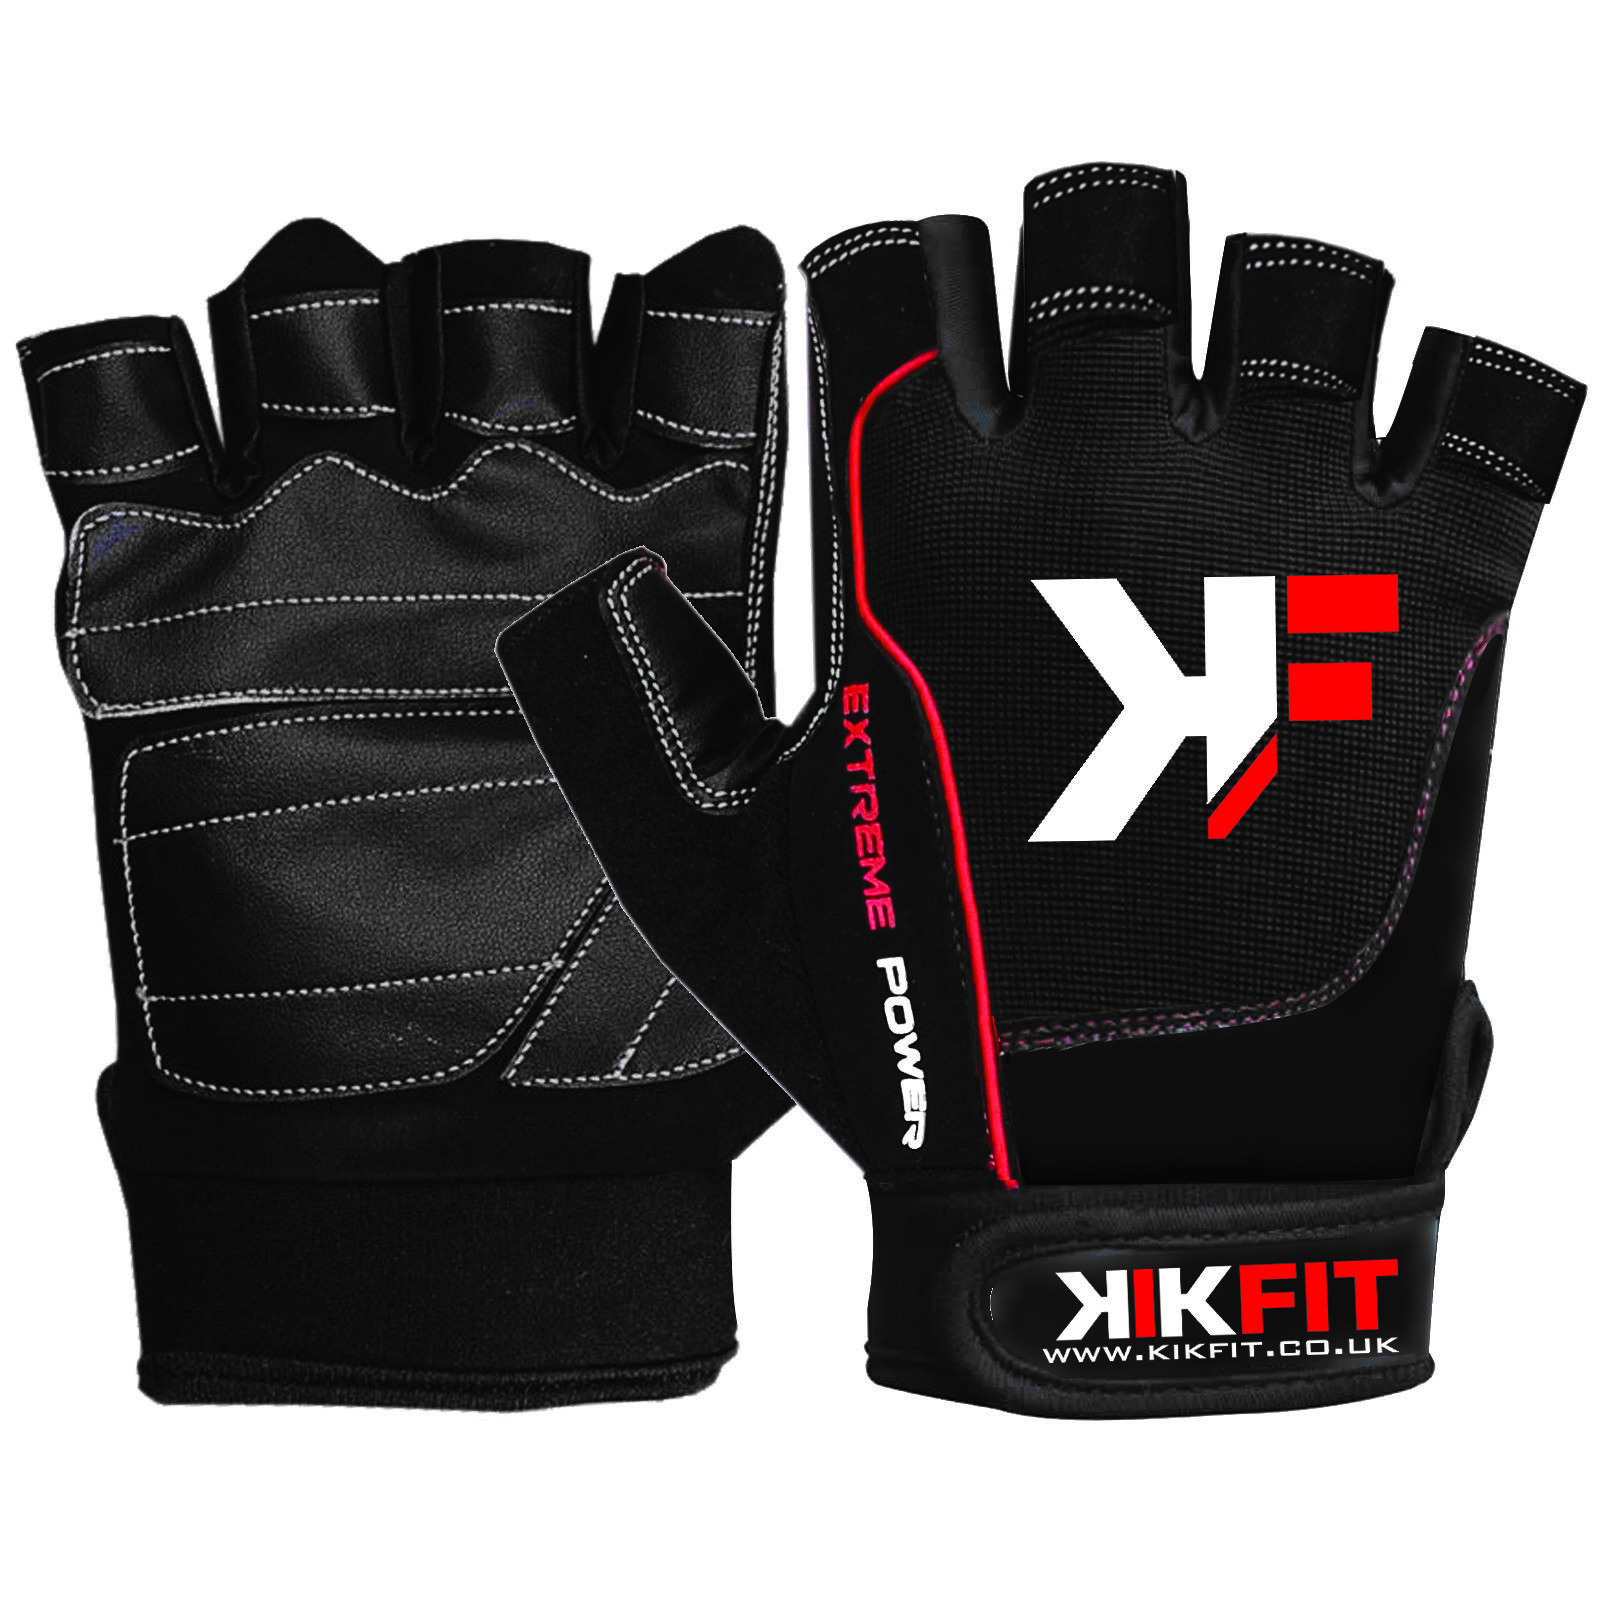 KIKFIT Leather Fingerless Wheelchair Gloves Bus Driving Gym